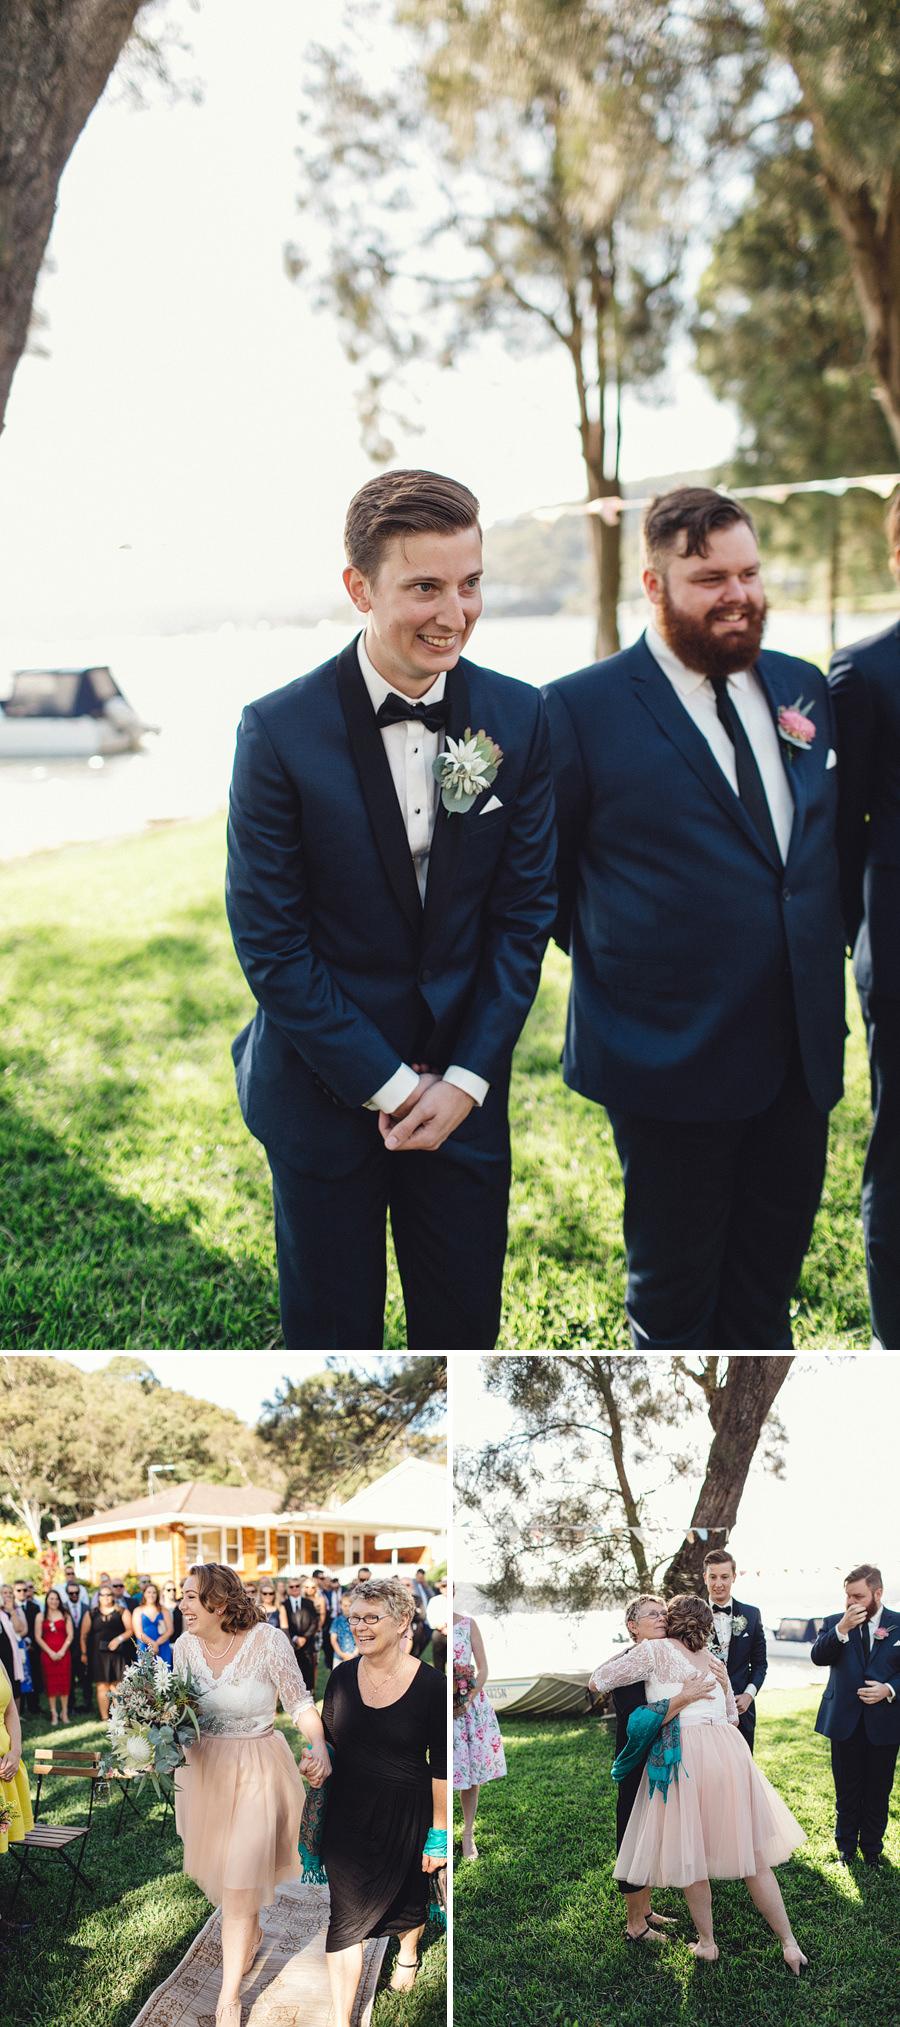 Currawong Reserve Wedding Photographers: Ceremony